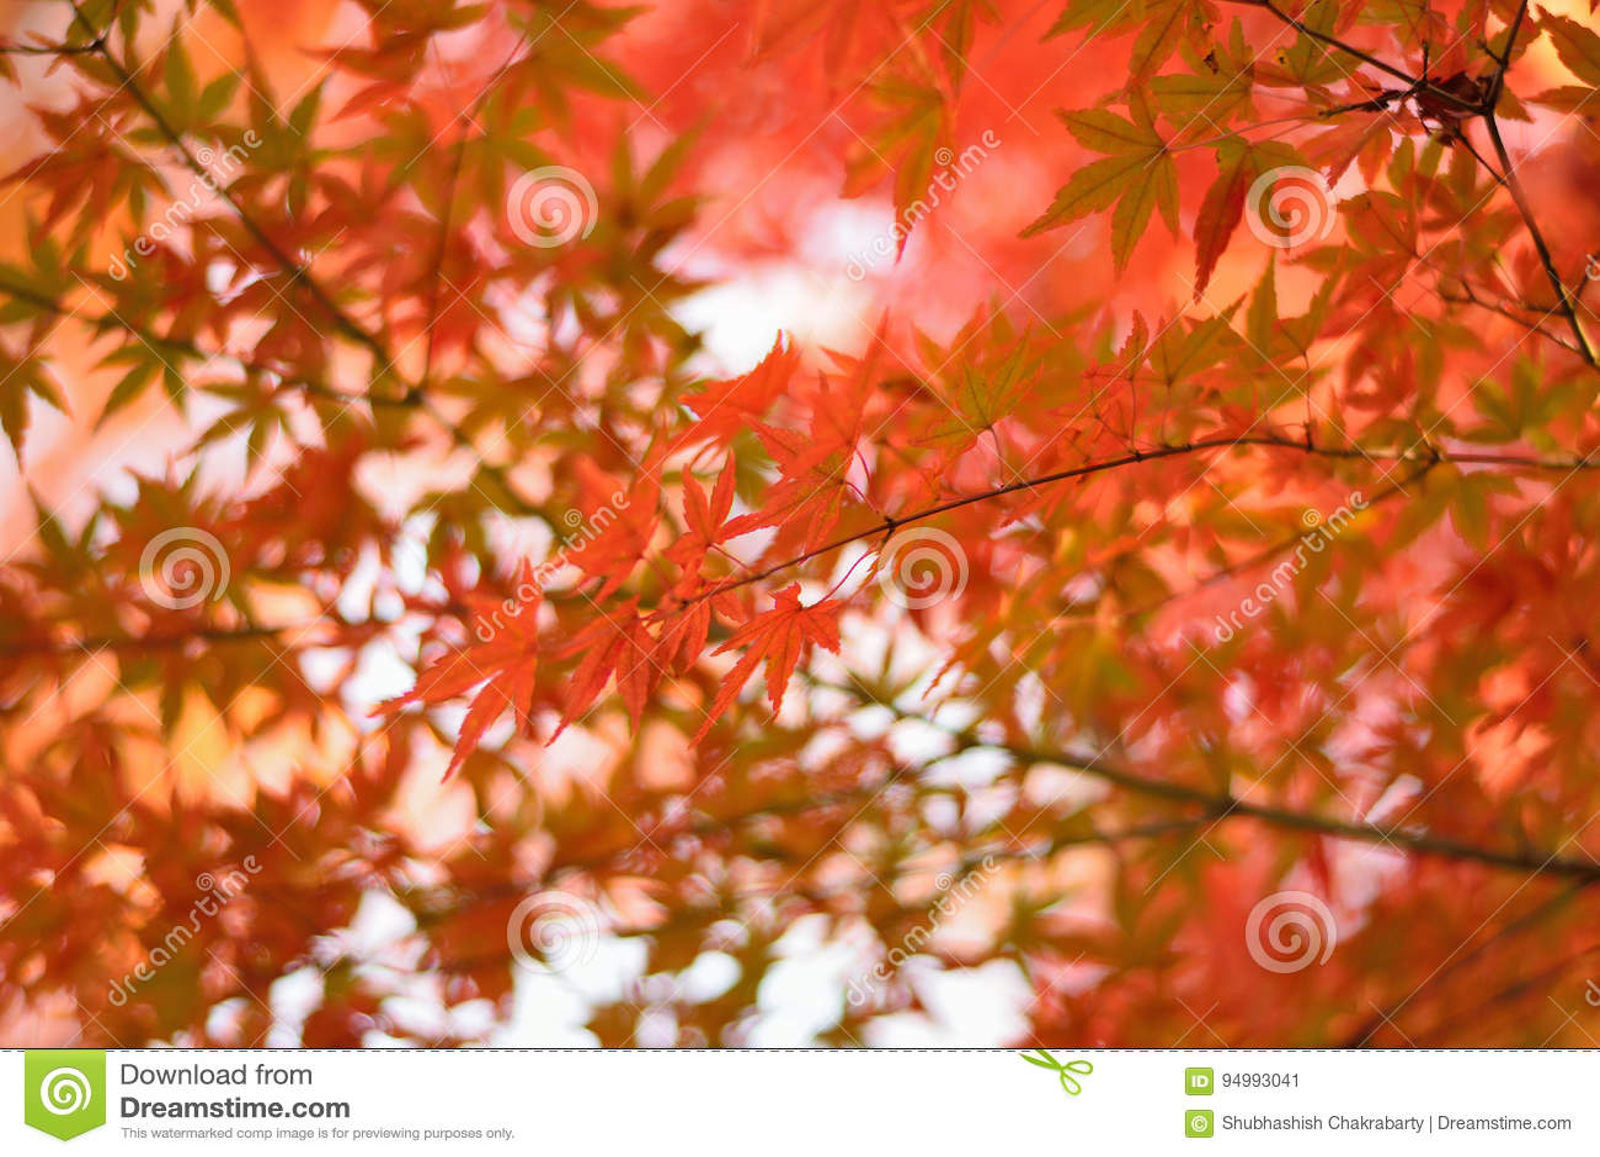 El japonés vibrante Autumn Maple deja paisaje con el fondo borroso